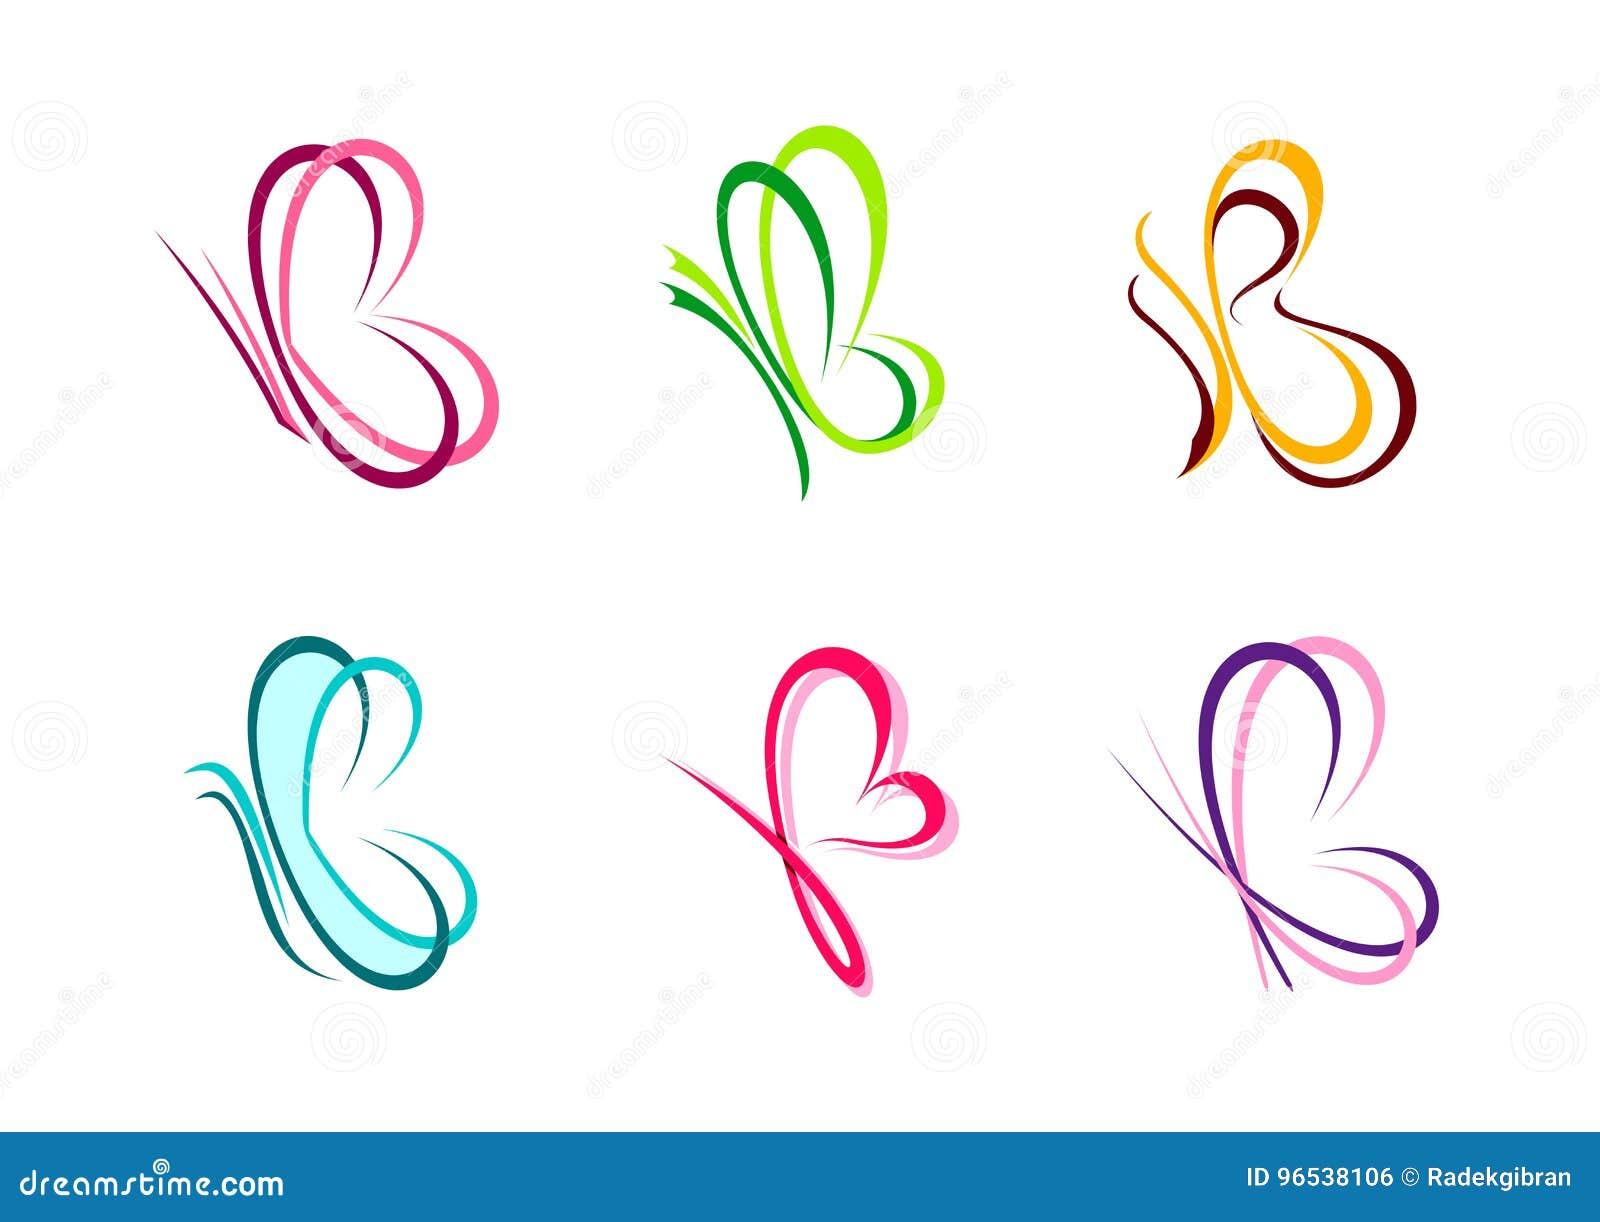 A borboleta, logotipo, coração, beleza, termas, relaxa, ama, as asas, ioga, estilo de vida, borboletas abstratas ajustadas do vet